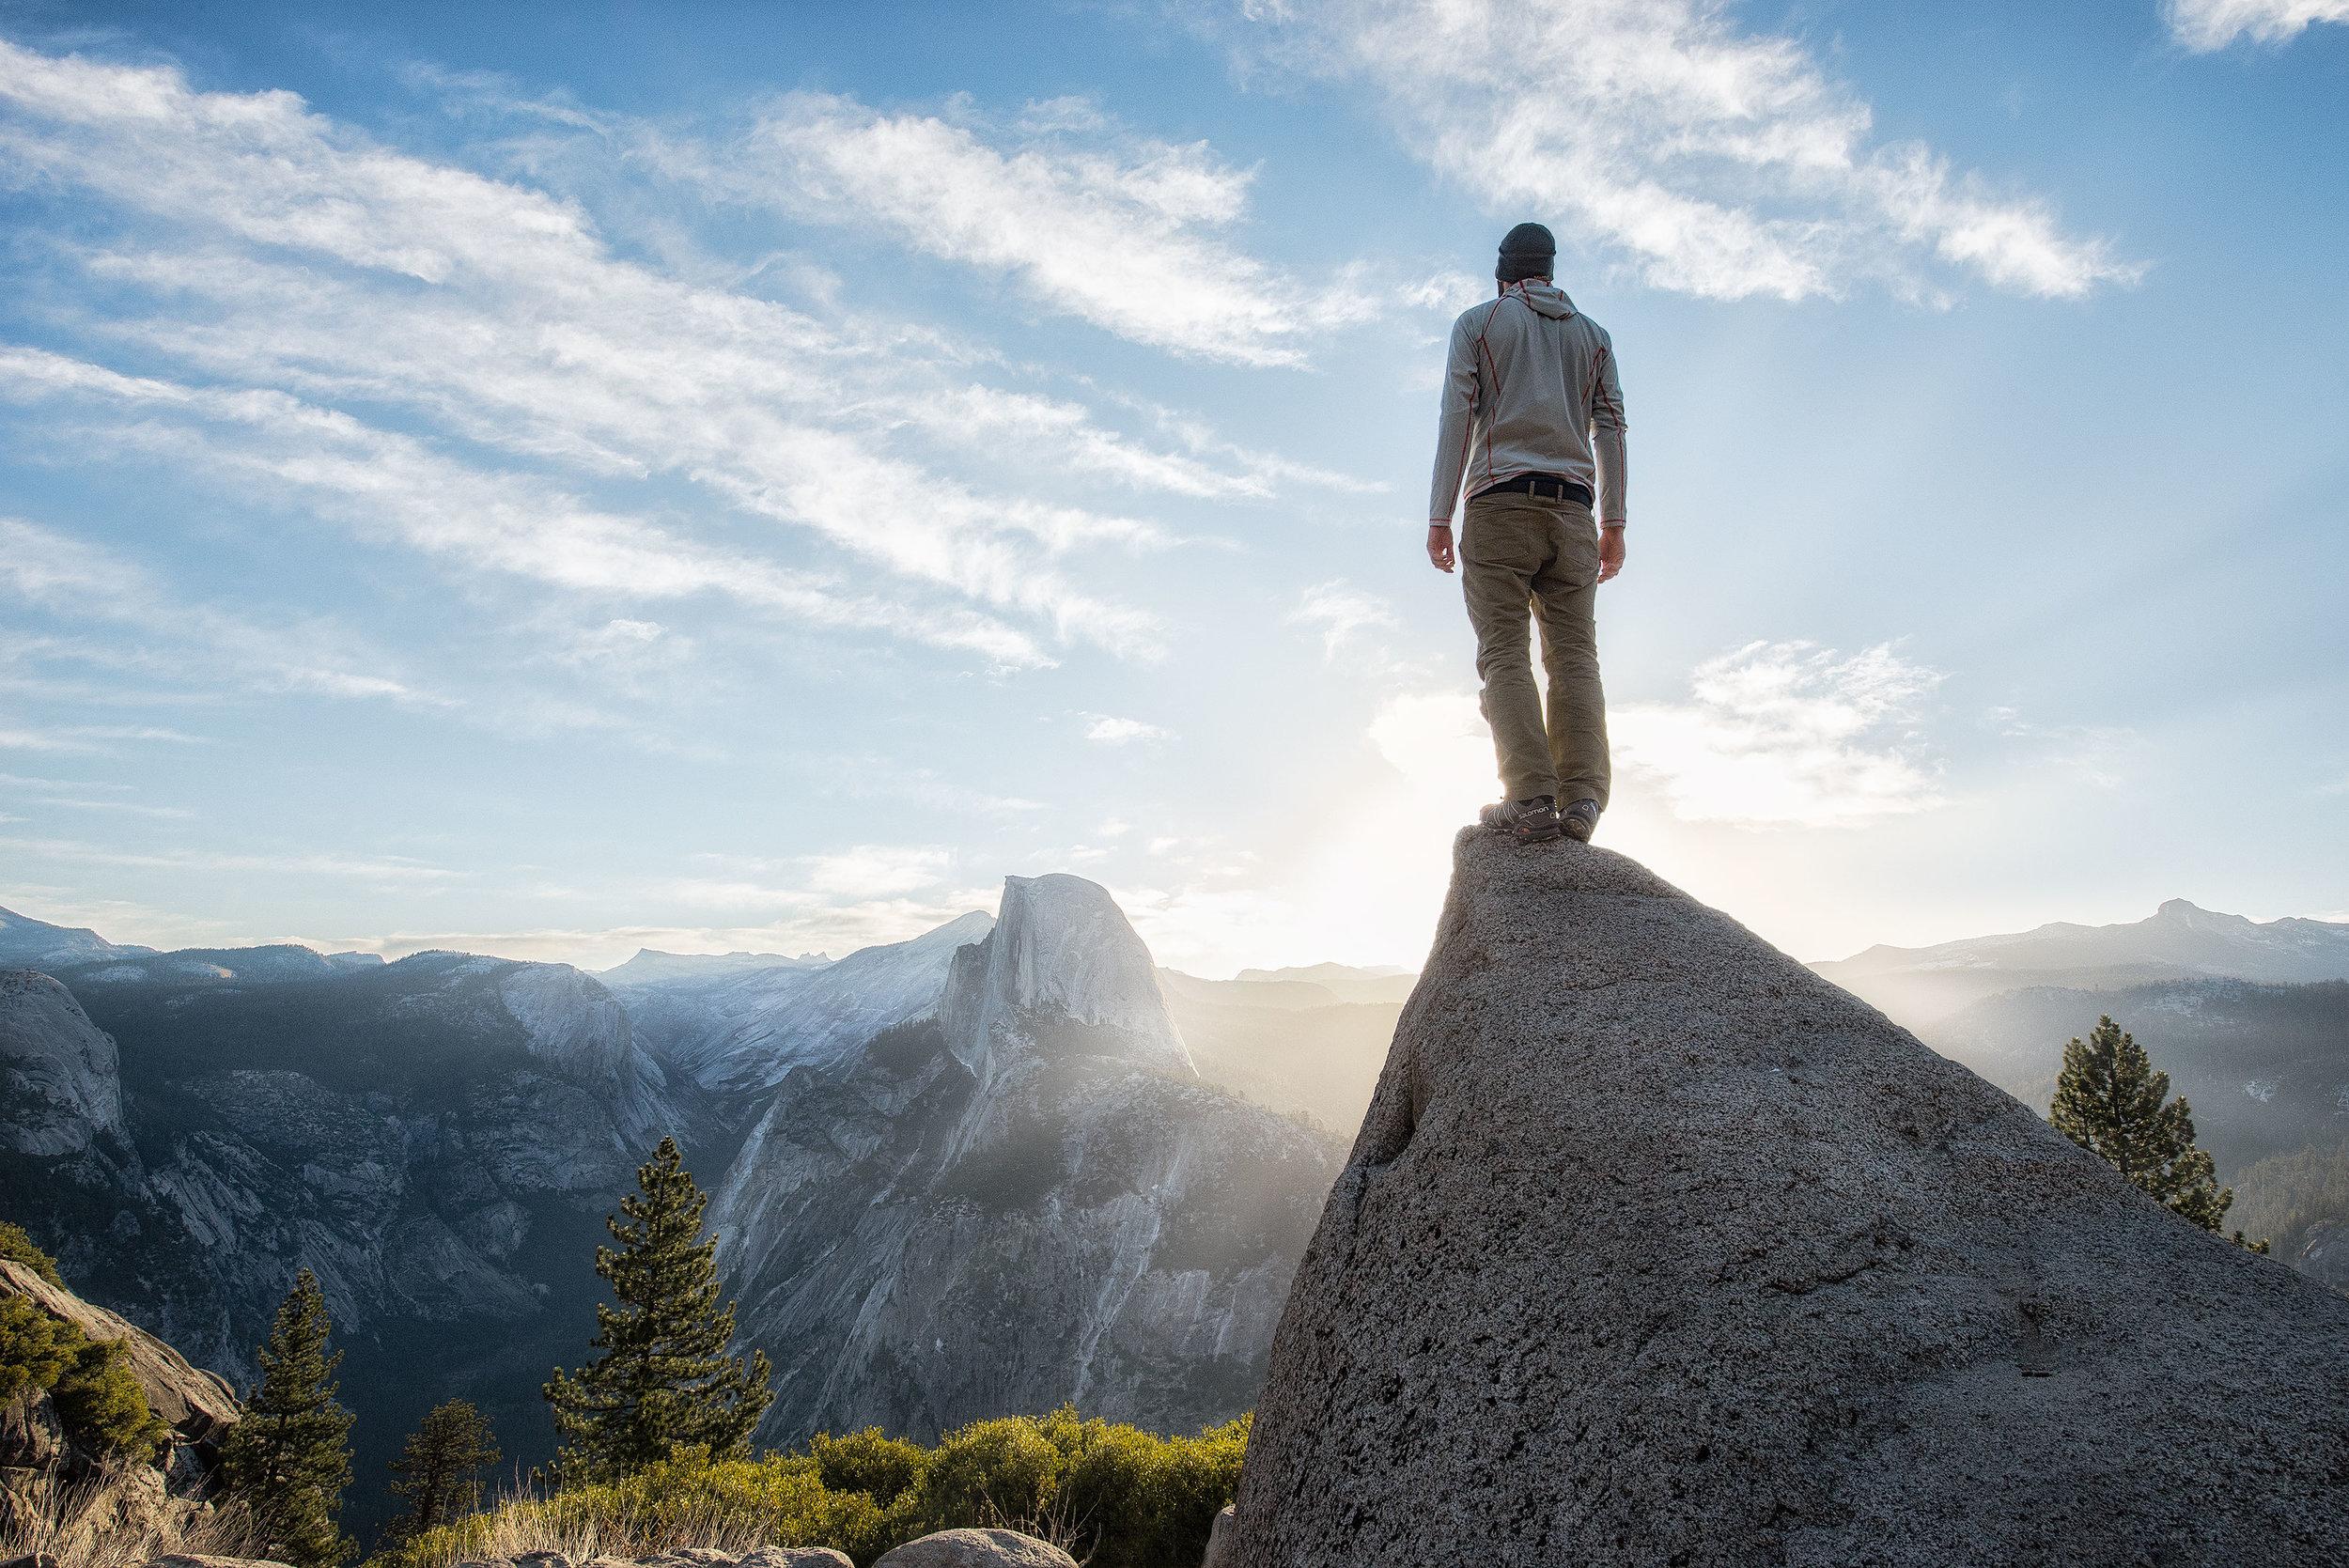 austin-trigg-yosemite-national-park-Glacier-point-sunrise-half-dome-california-hiking-adventure.jpg